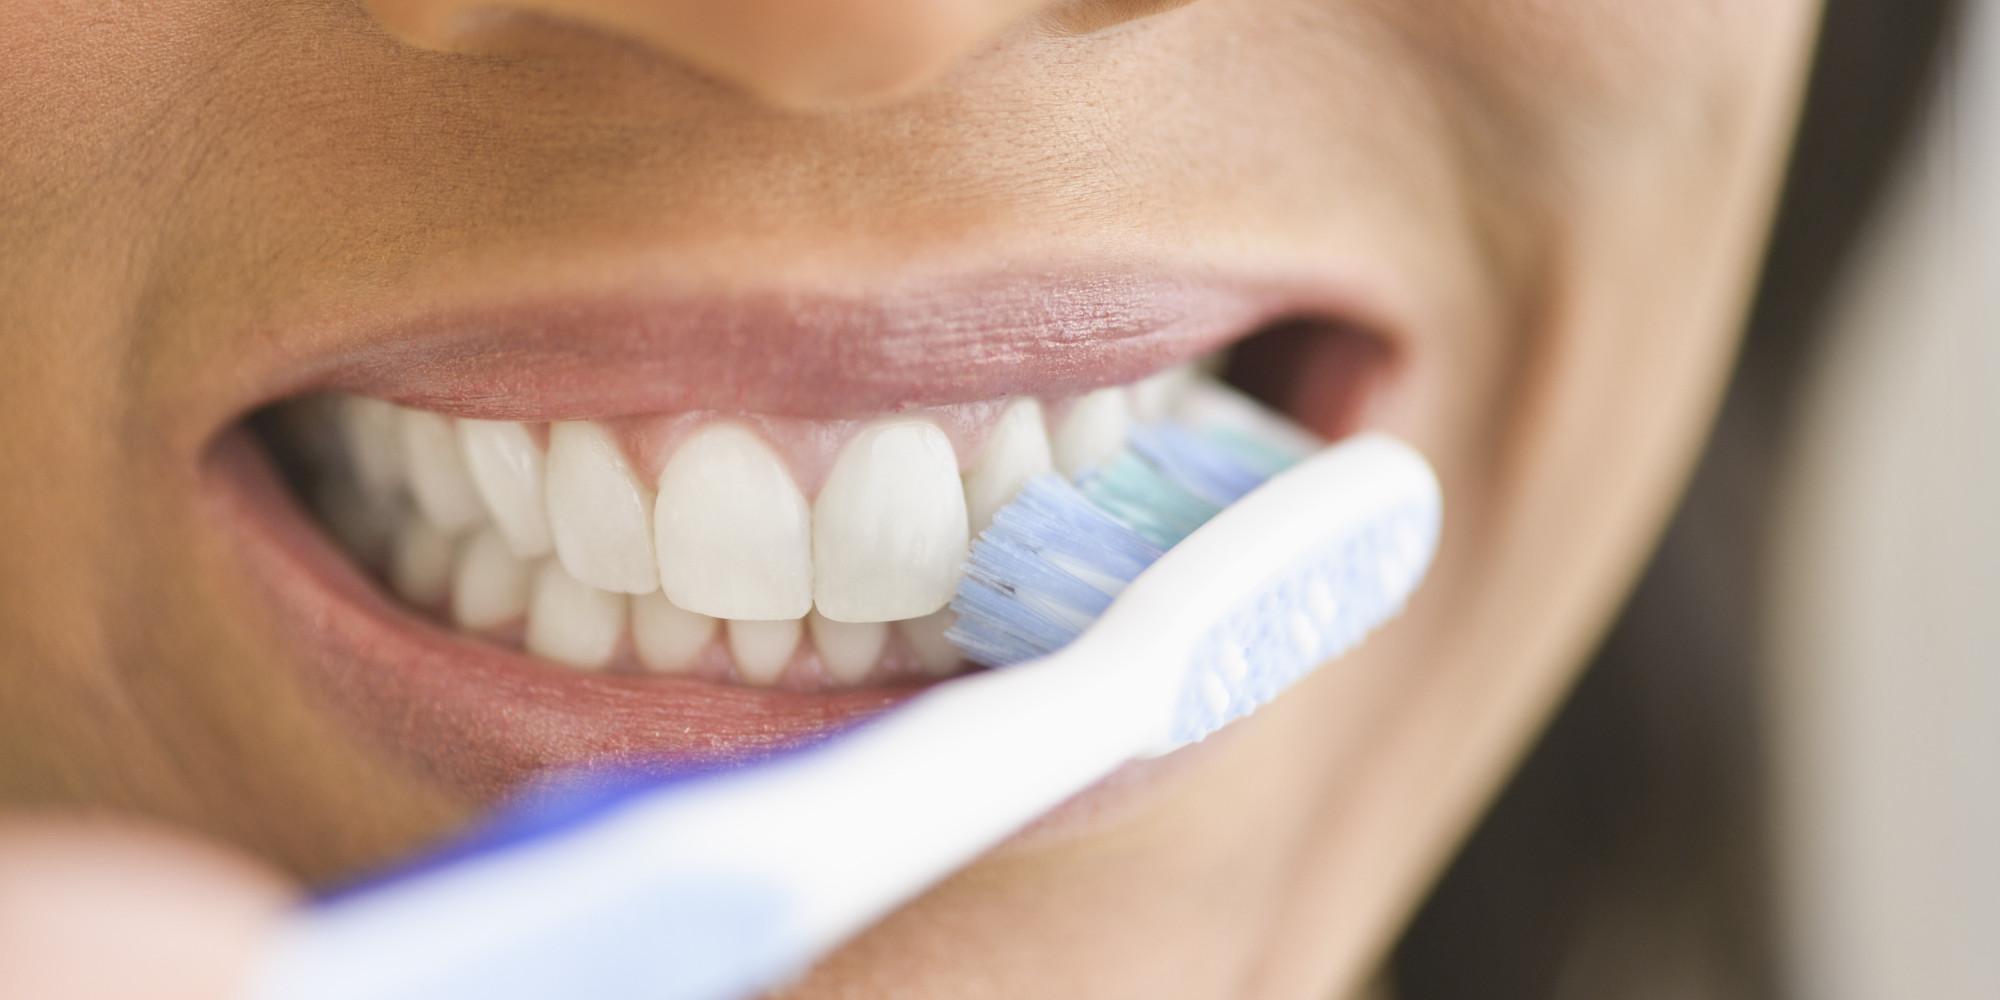 boca dientes podridos